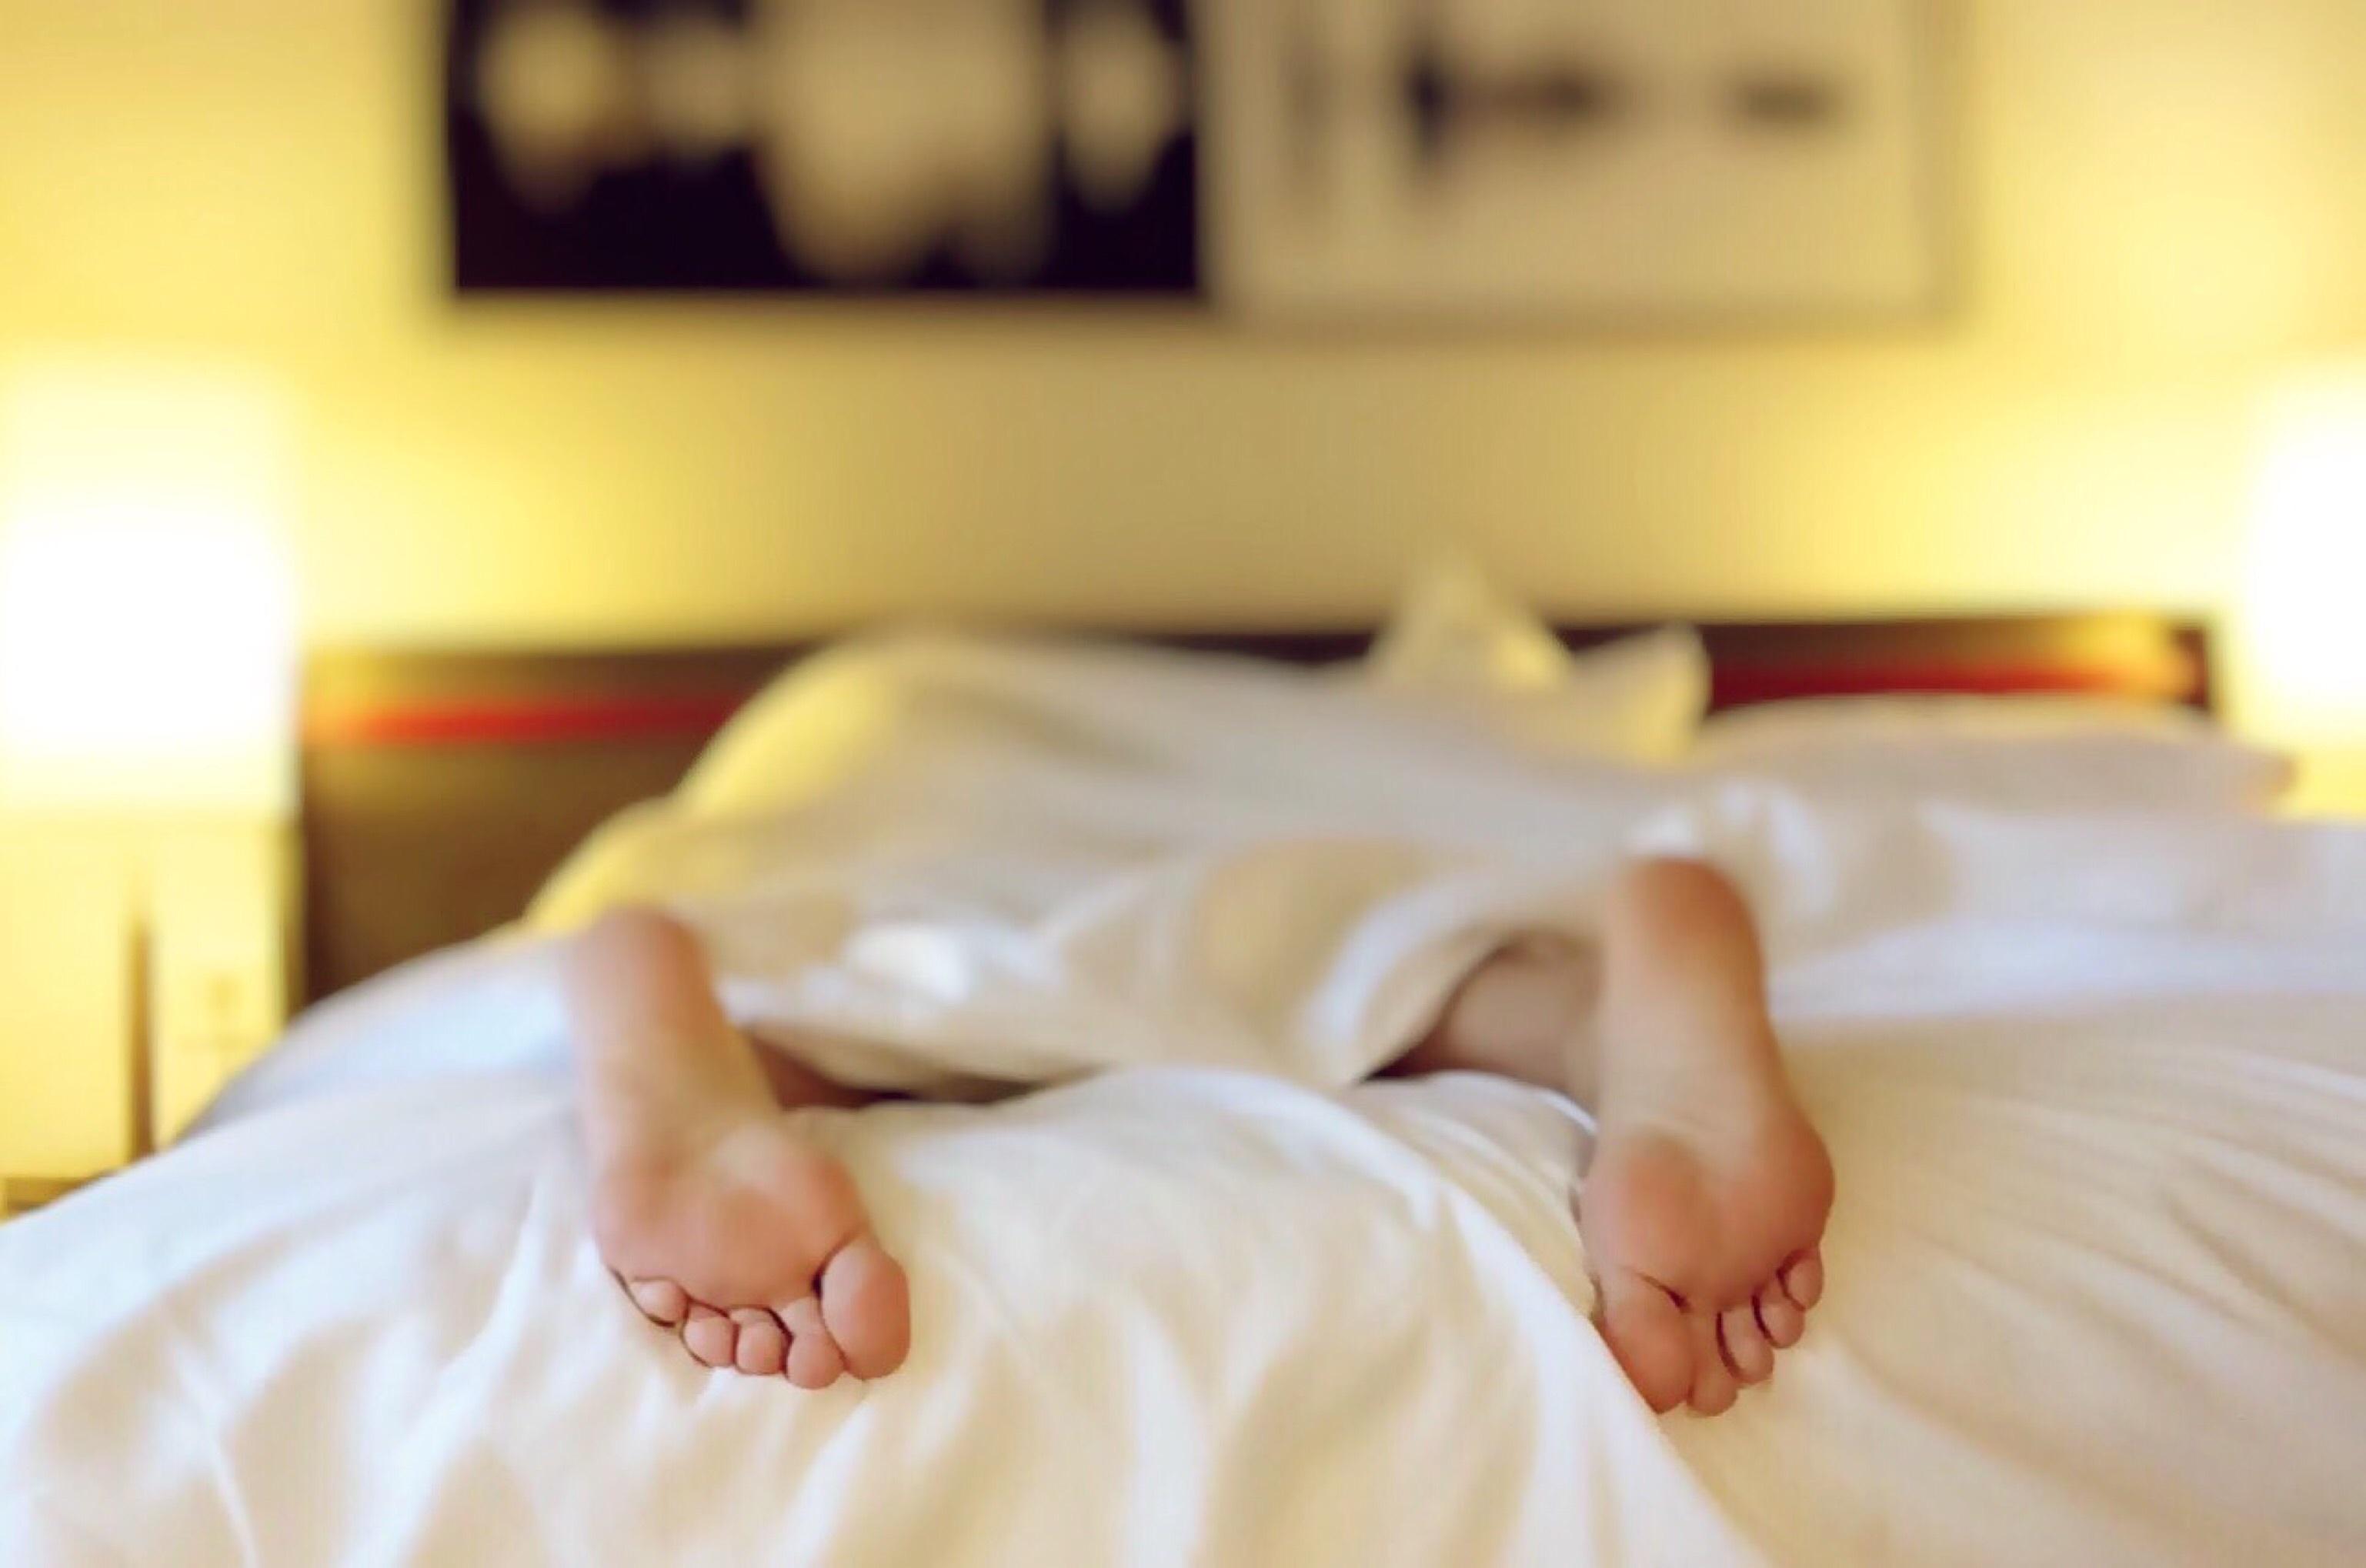 spiaca-osoba